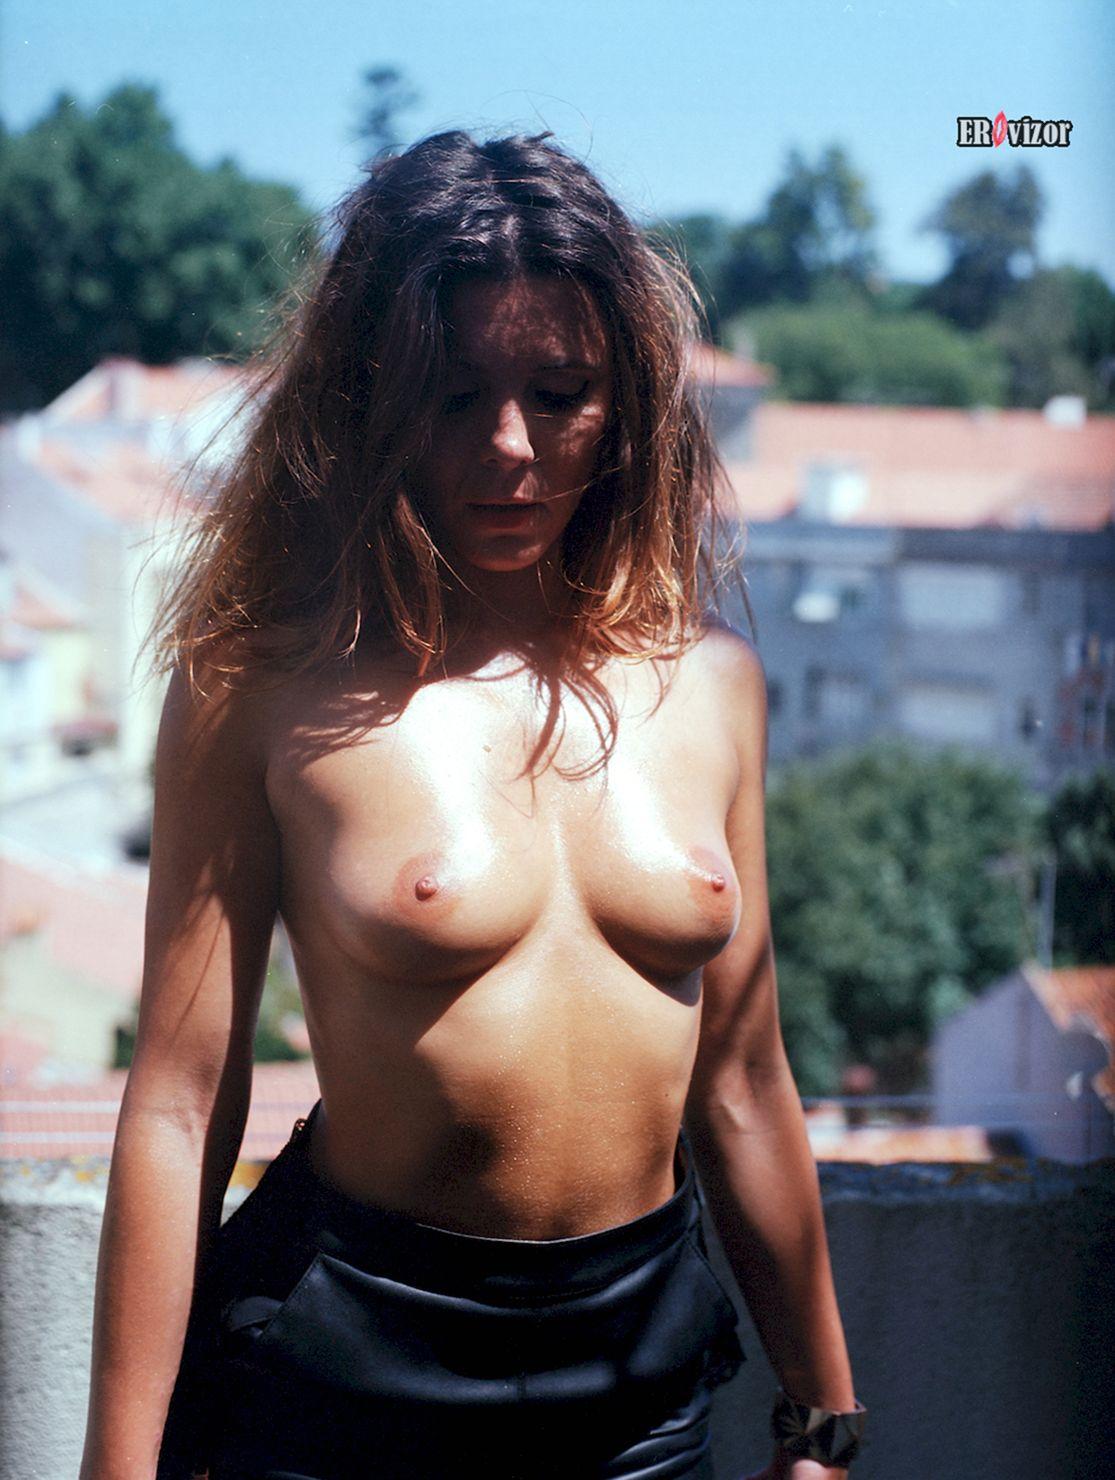 legkaya_erotica-erovizor (49)